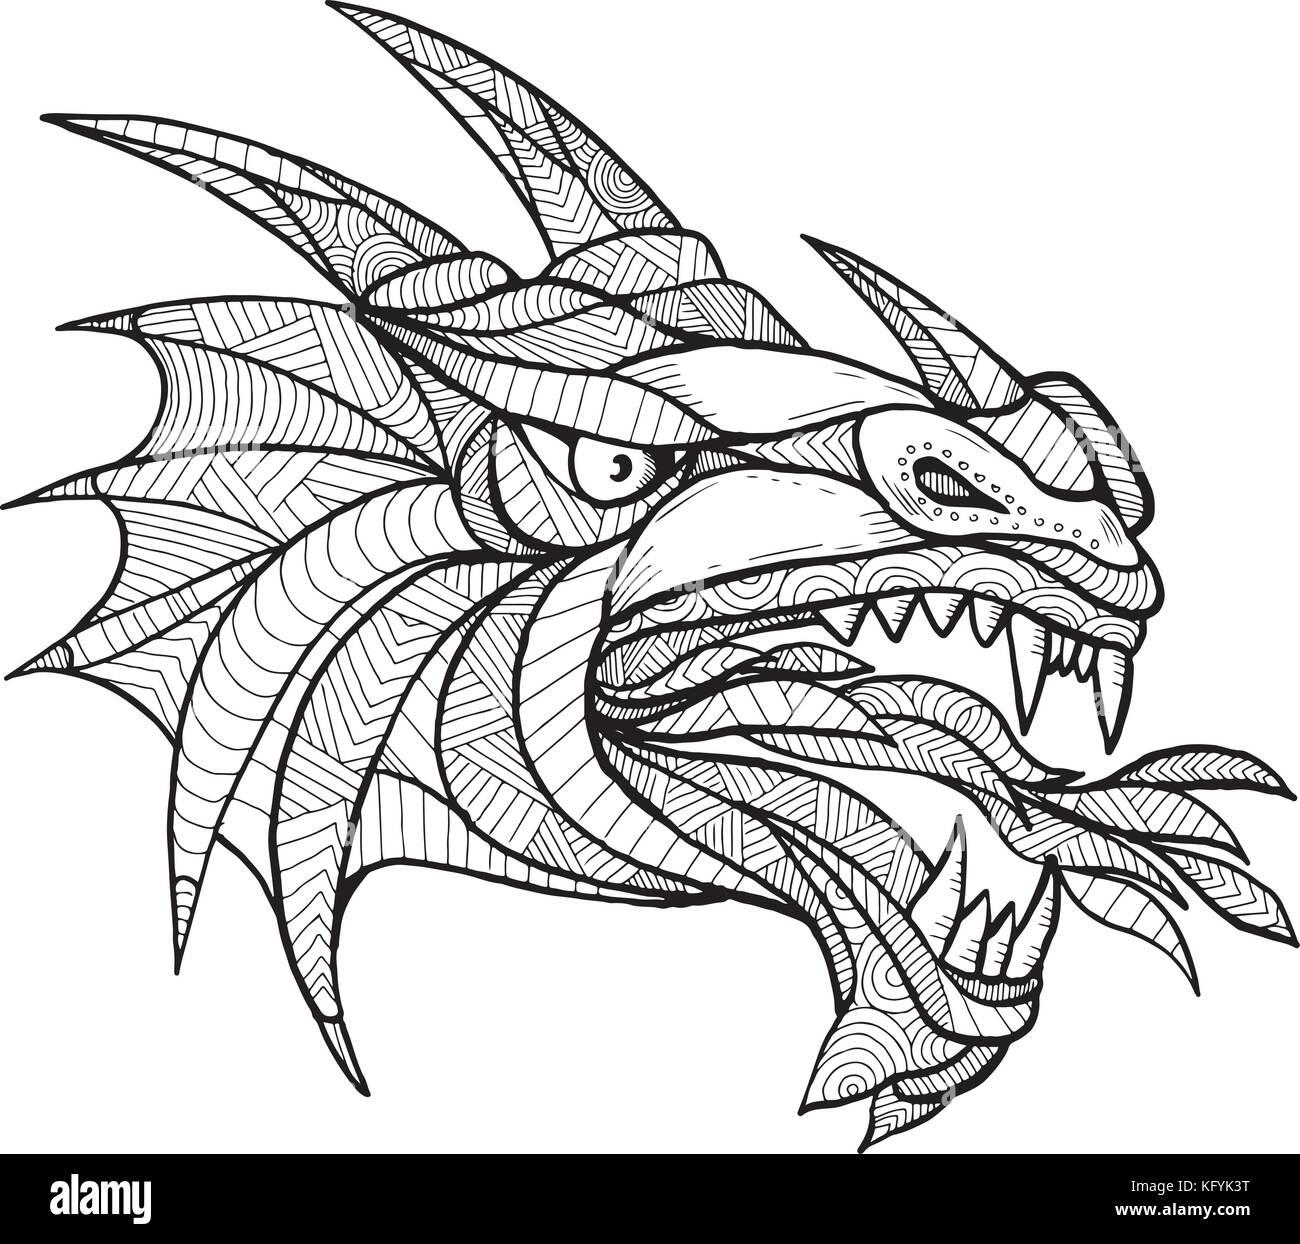 Zentangle inspired stock photos zentangle inspired stock images alamy - Mandala de dragon ...